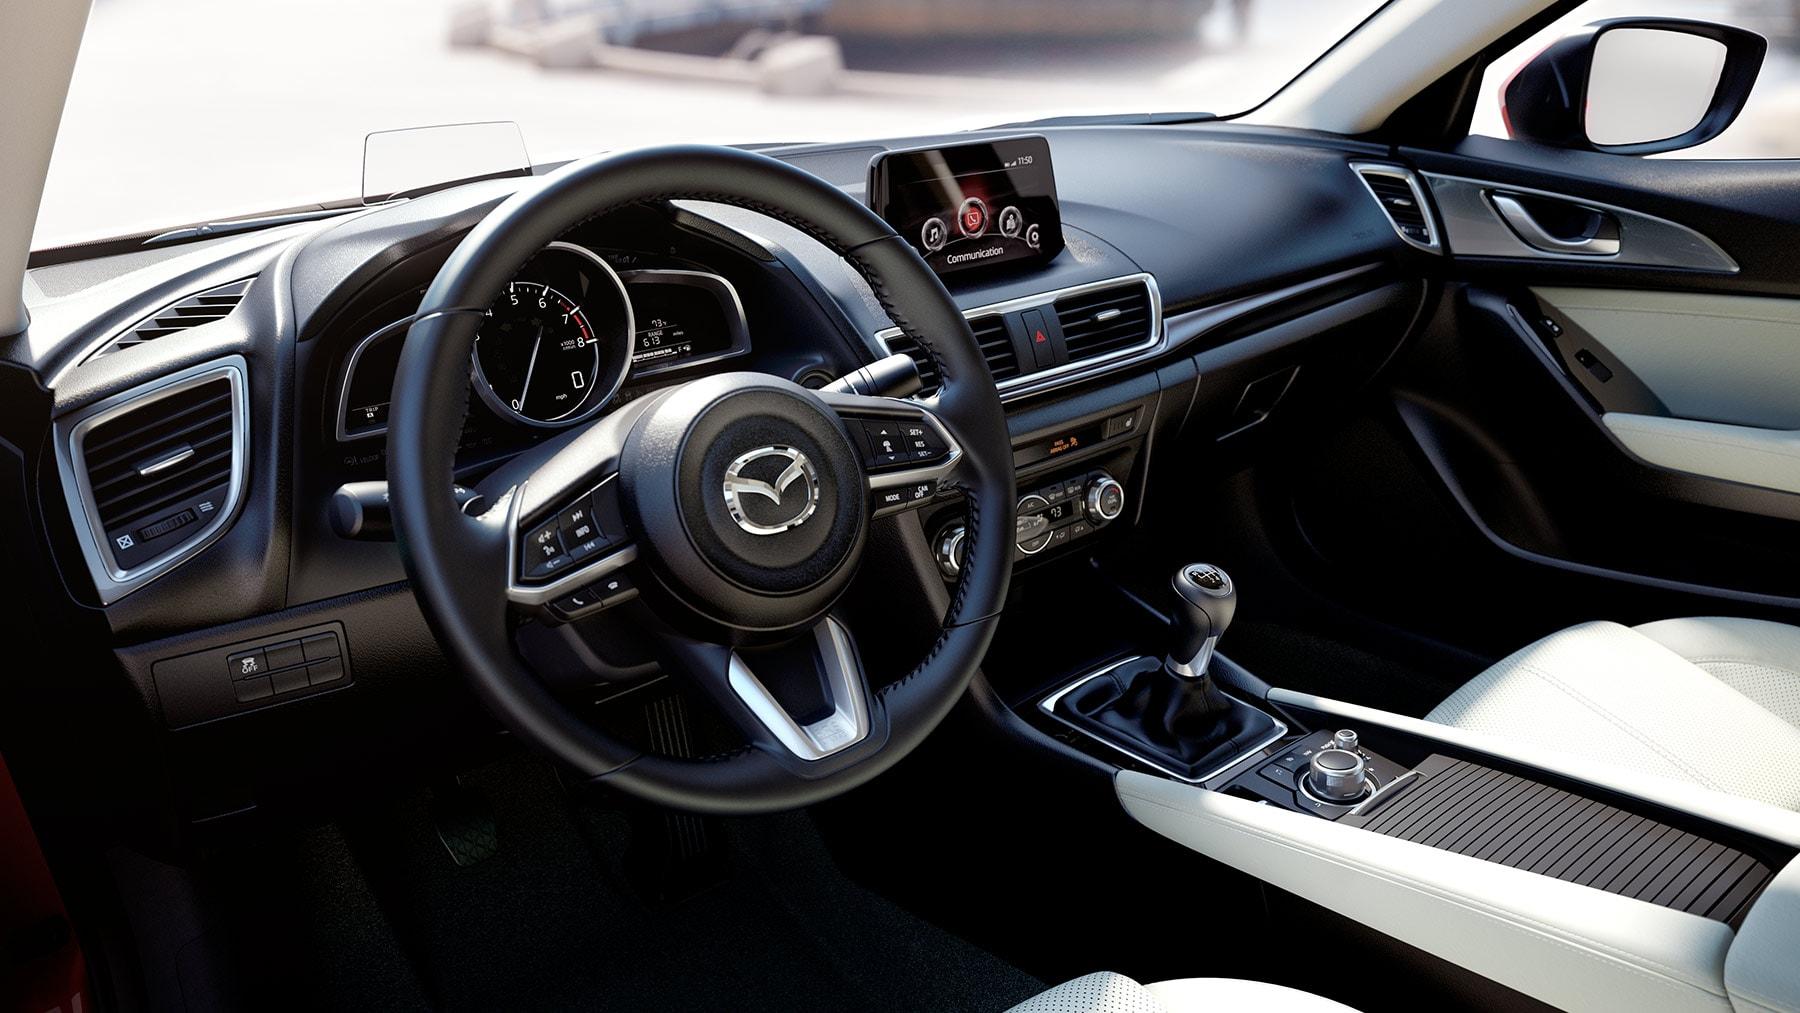 2017 Mazda3 Vs 2017 Ford Focus Near Columbia, SC